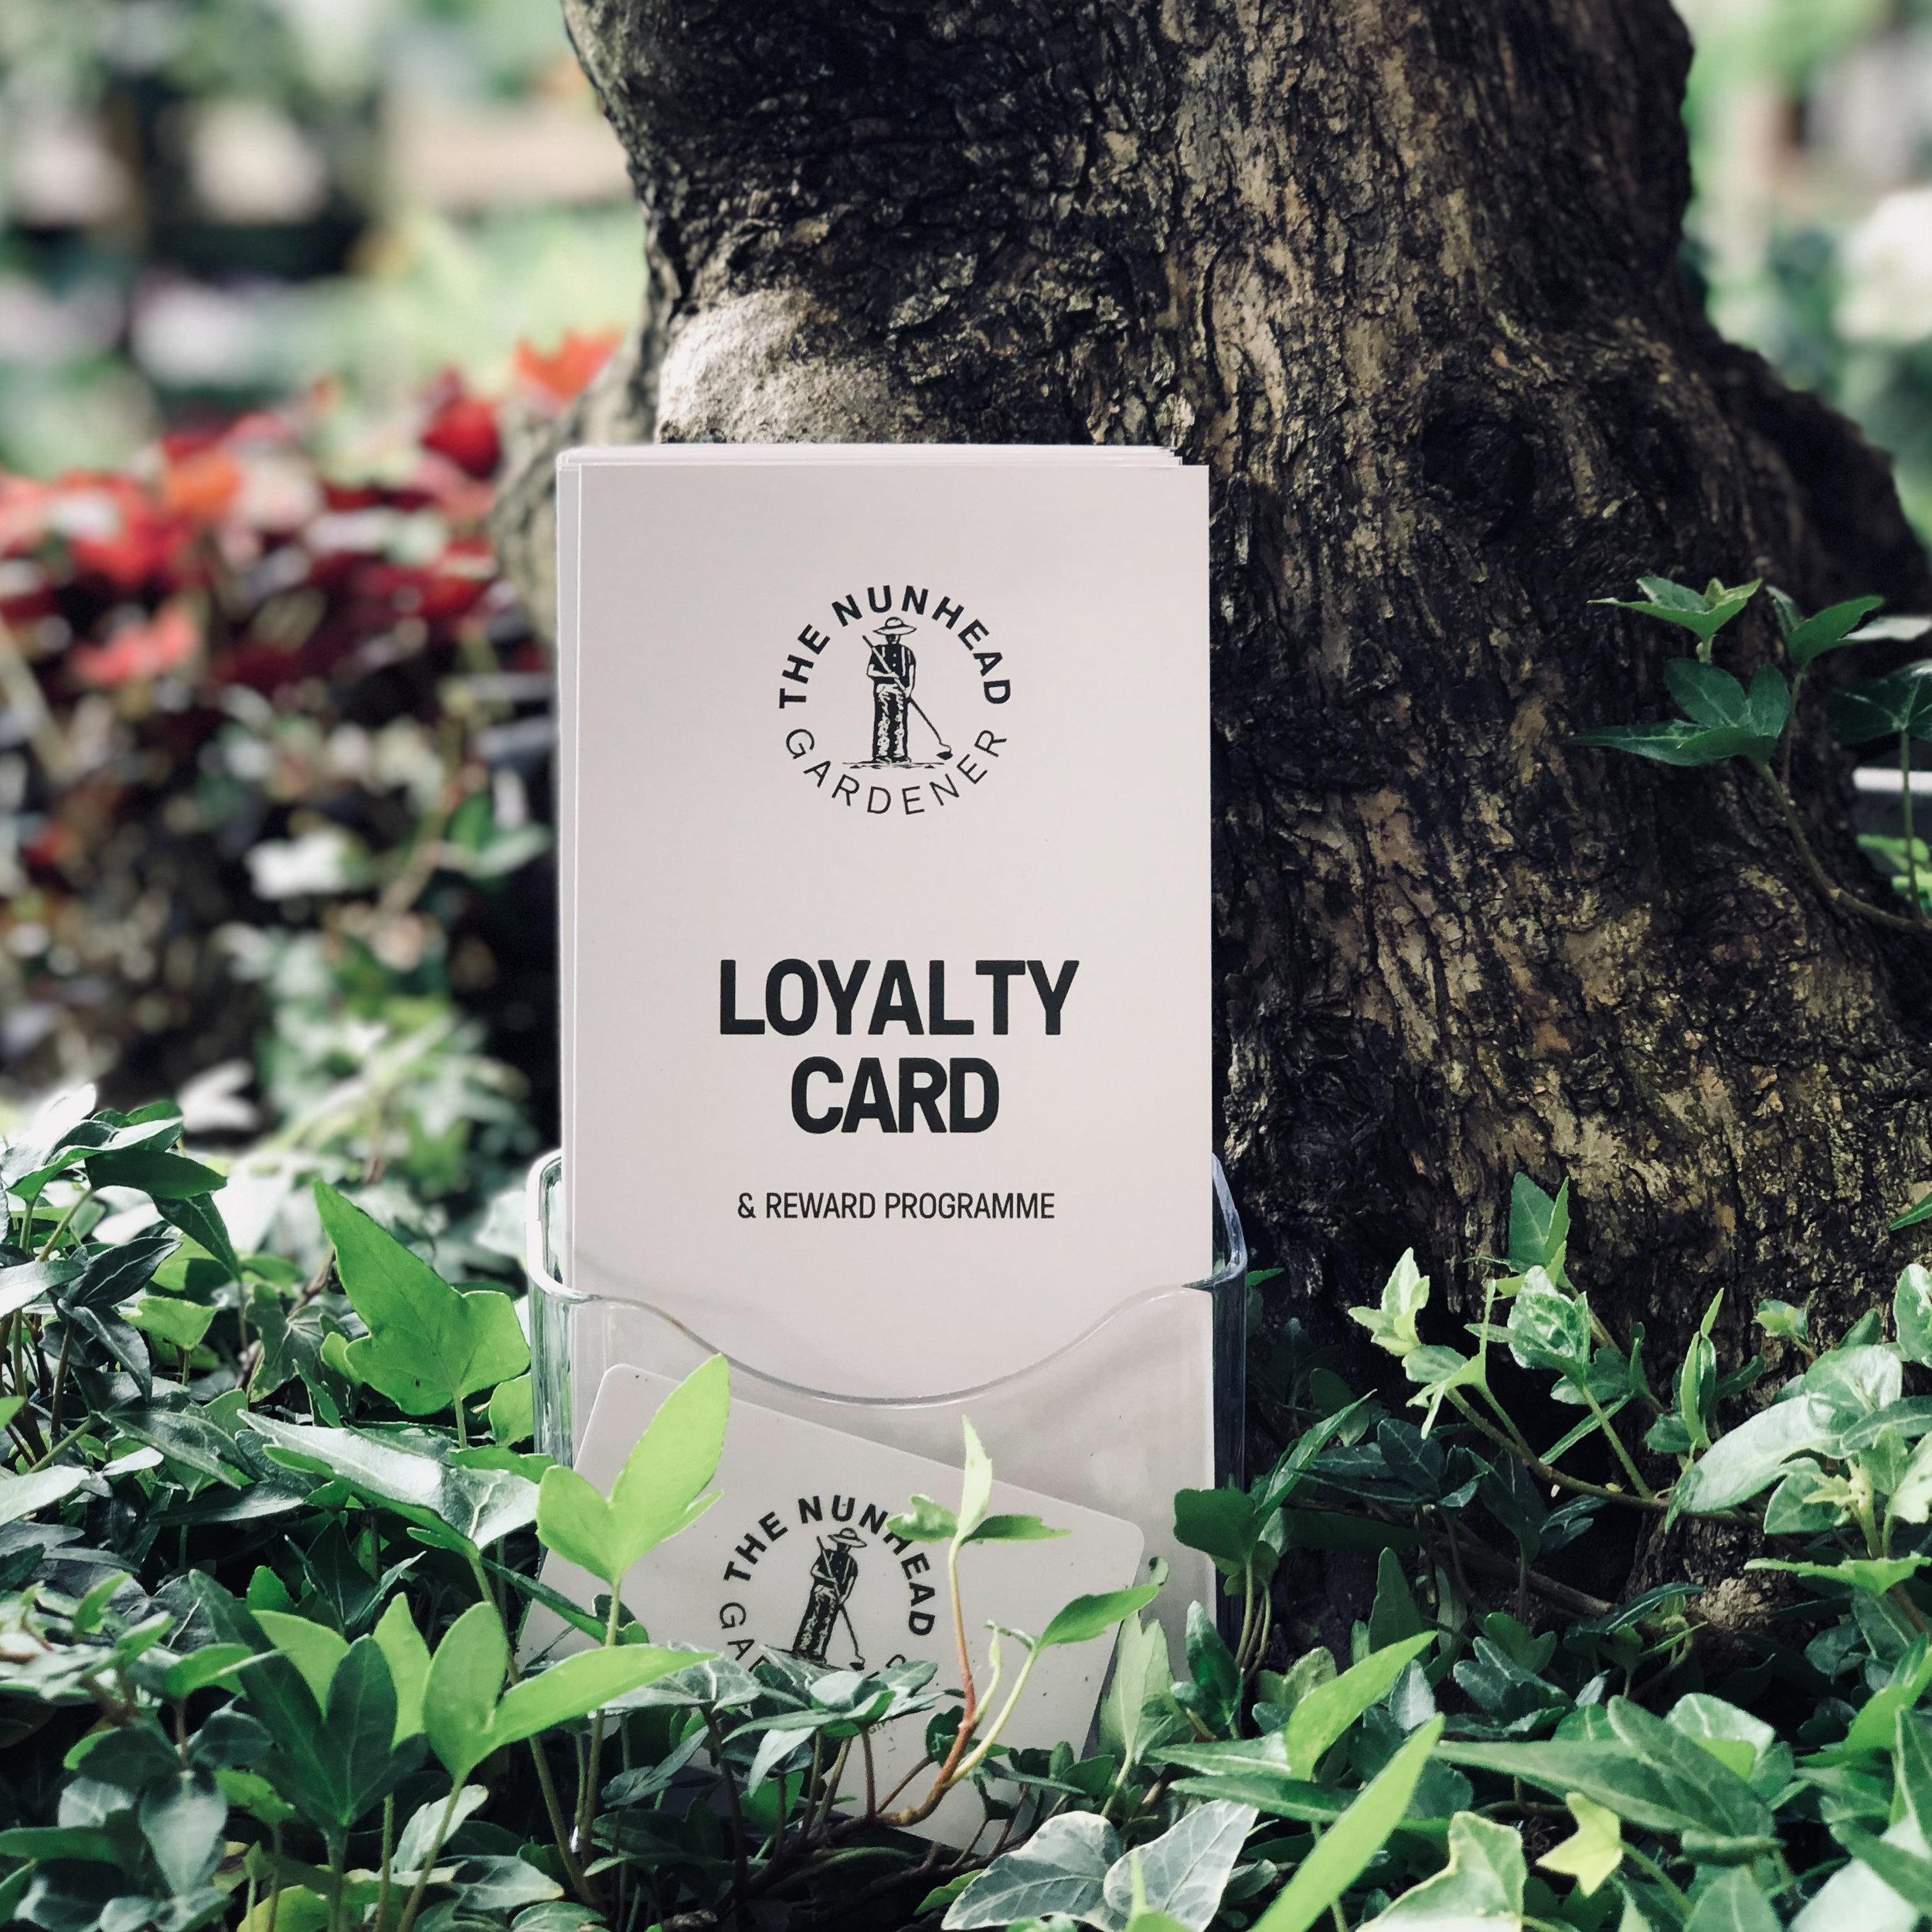 Loyalty Card - & REWARD PROGRAMME